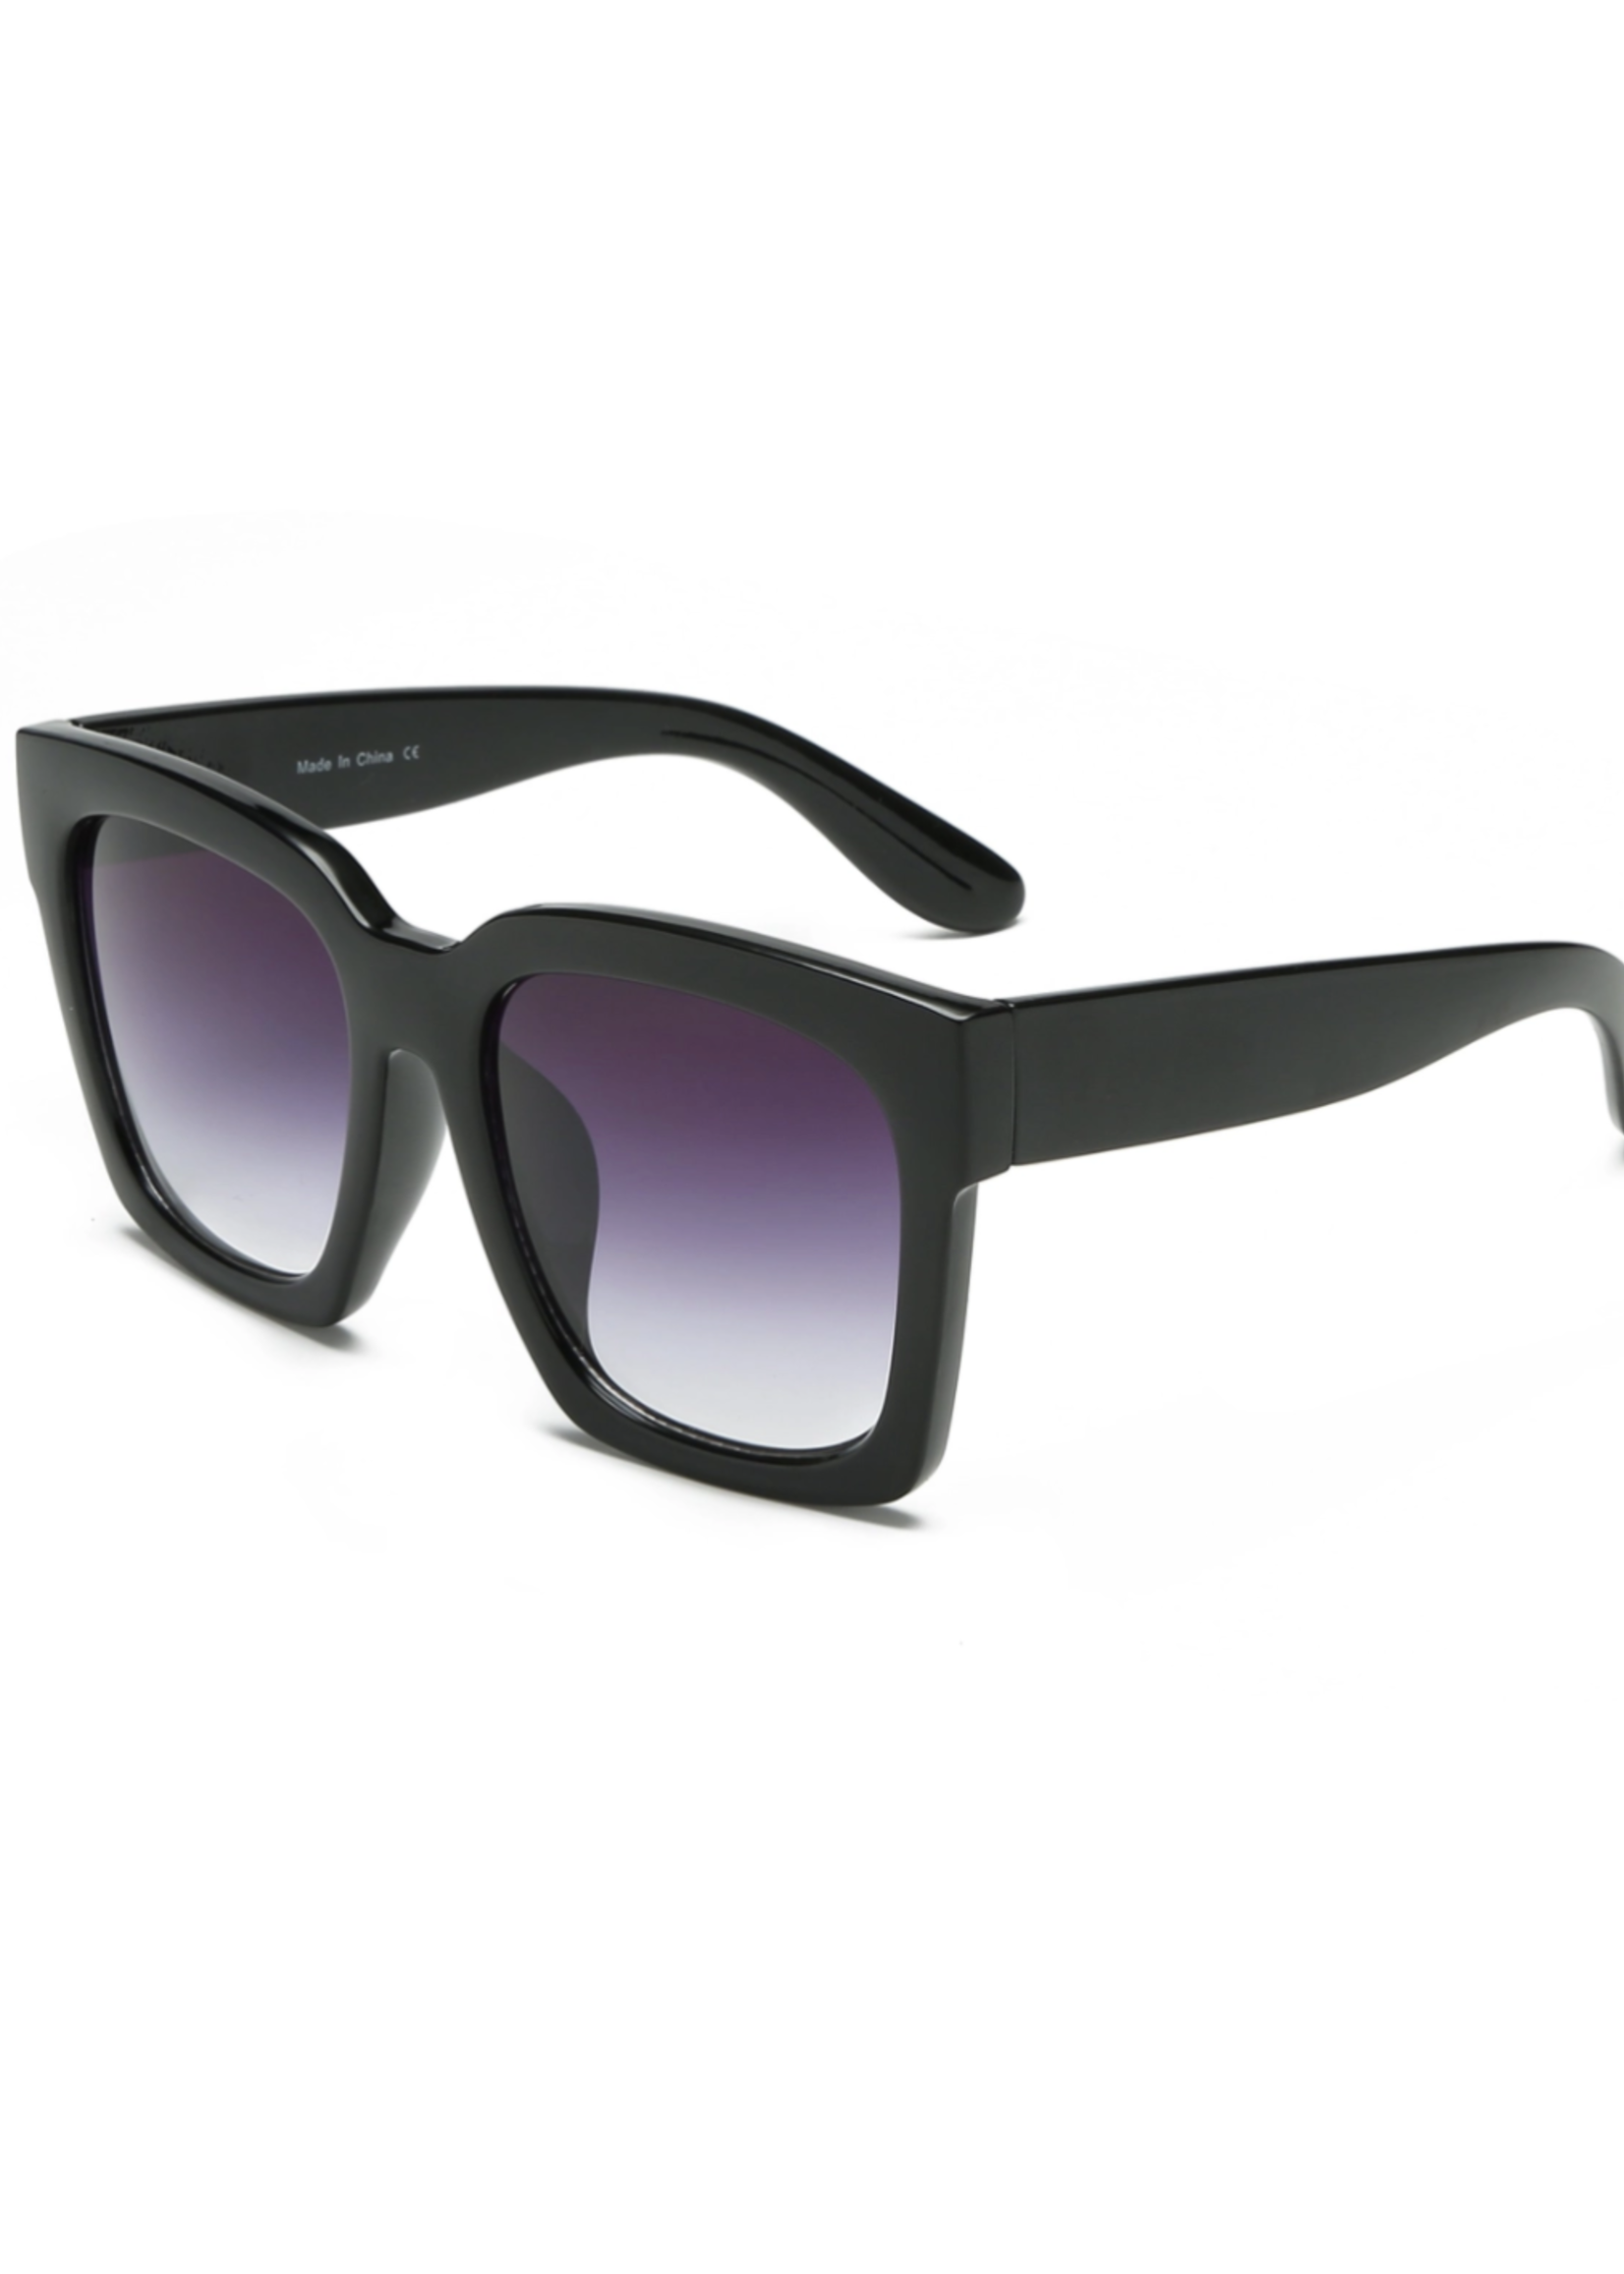 August Avenue Eyewear DTLA   Oversized Frame Sunglasses